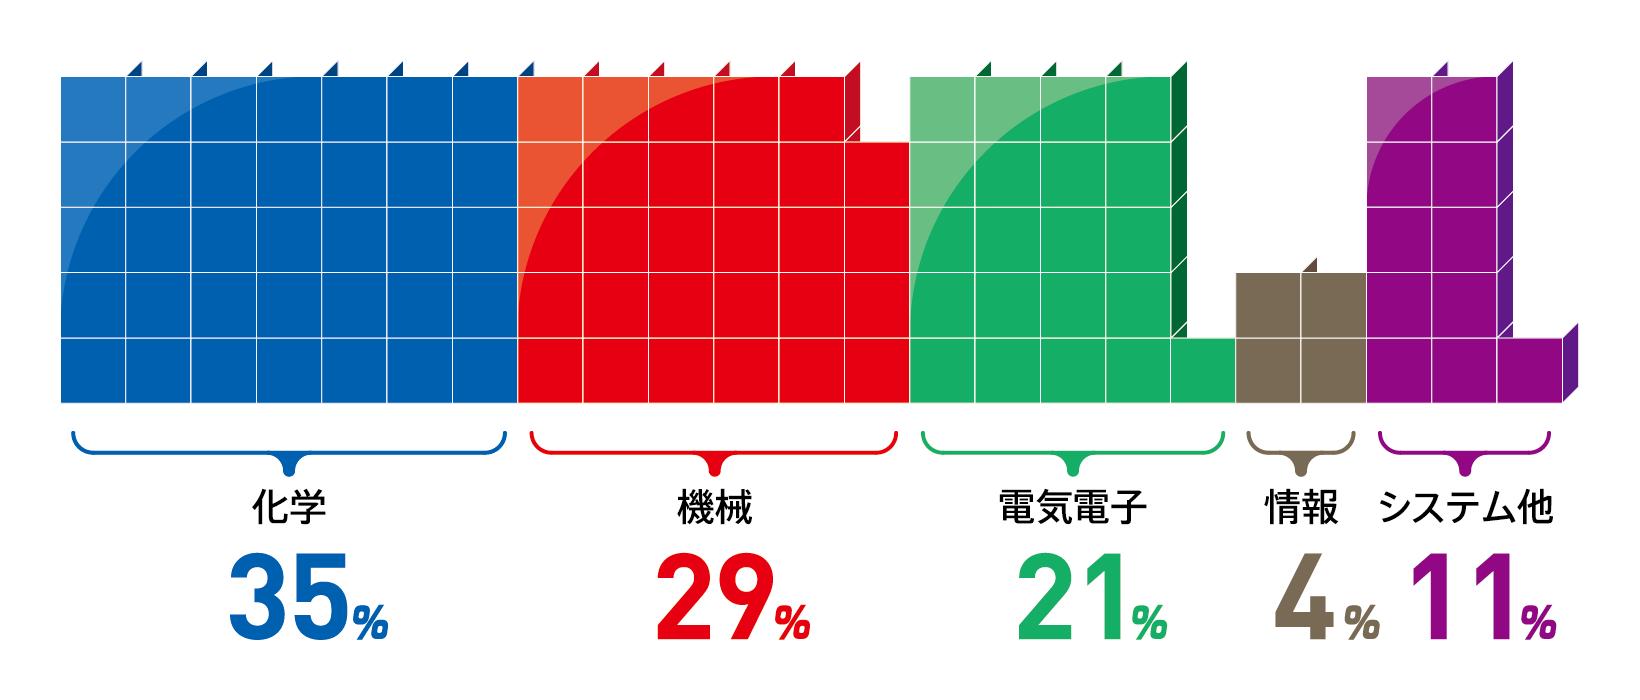 化学:35% 機械:29% 電気電子:21% 情報:4% システム他:11%